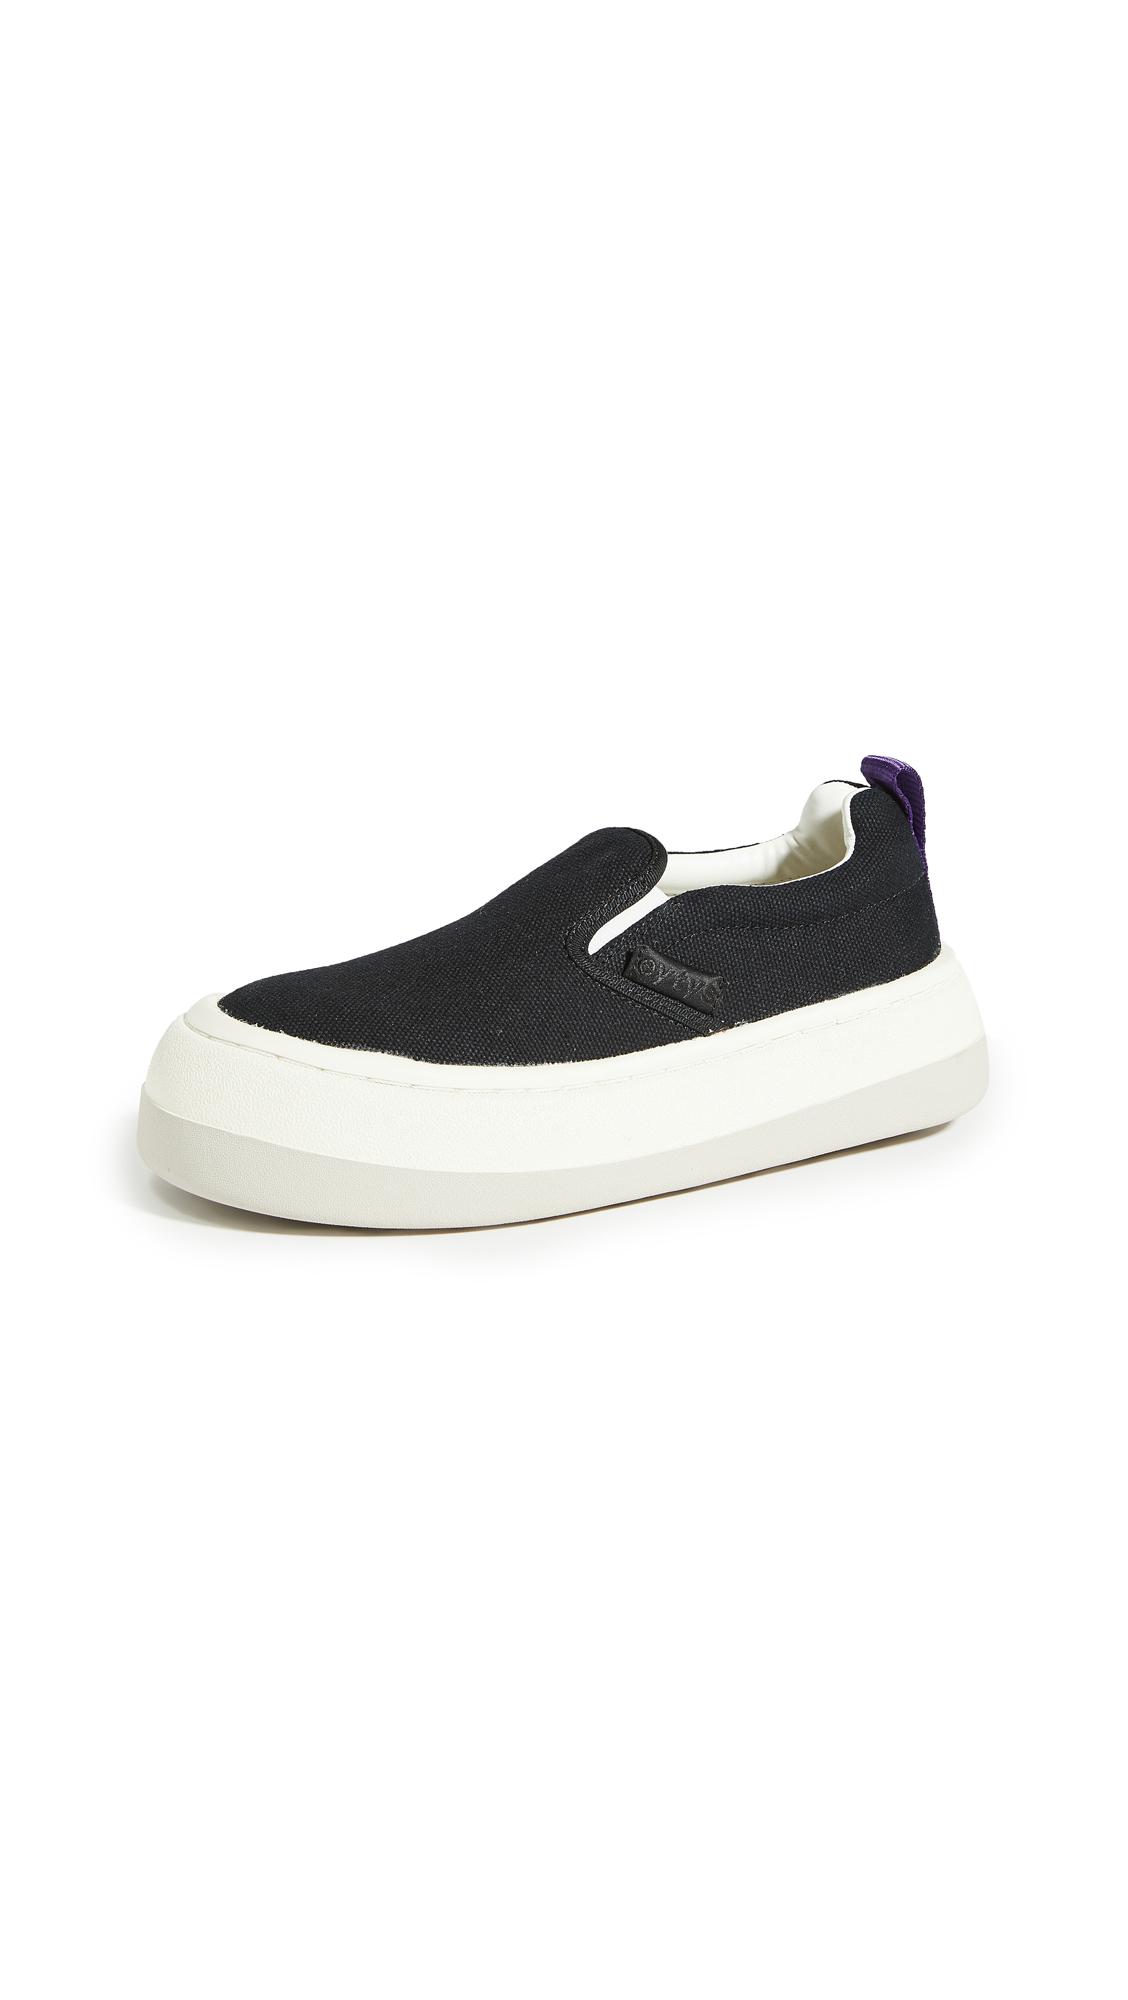 Eytys Venice Slip On Sneakers